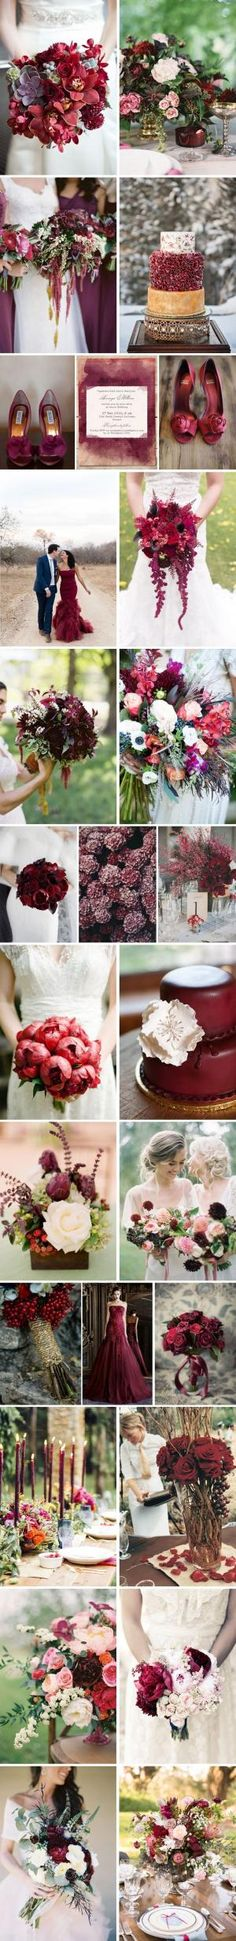 pantone color of 2015 marsala wedding inspiration by alhely